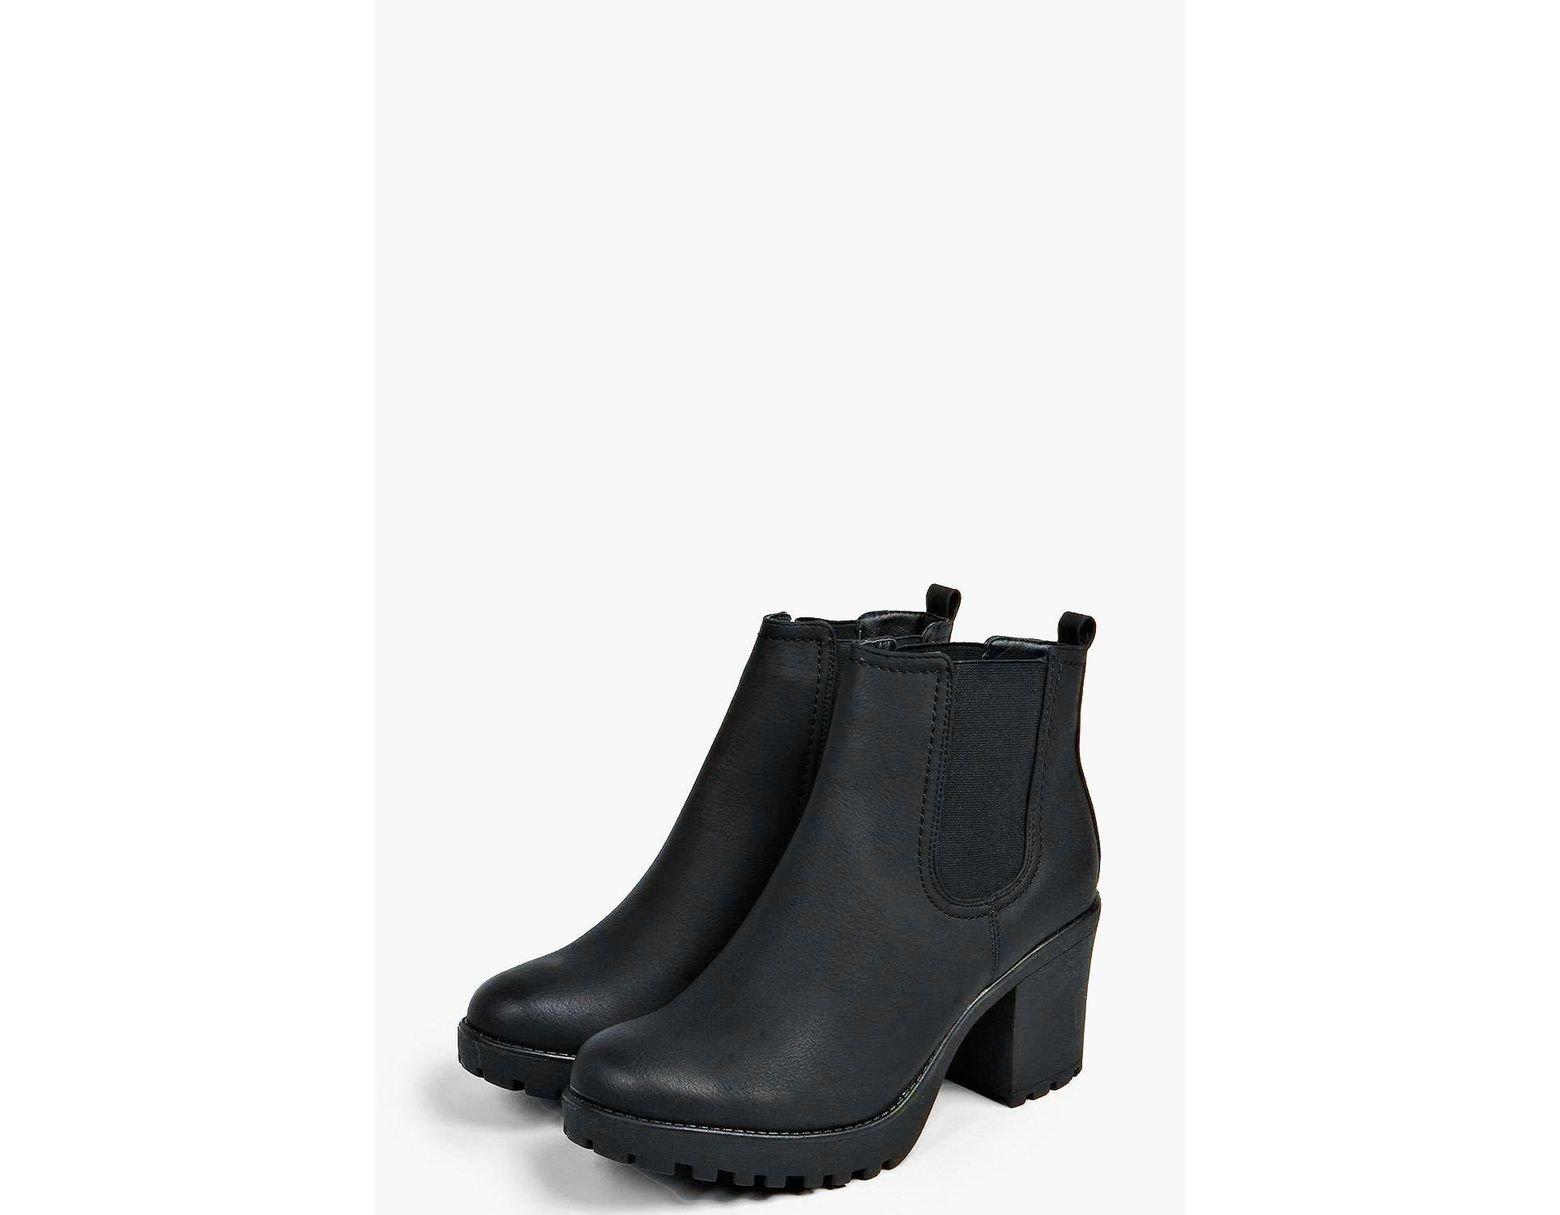 8180b0fa59a8 Lyst - Boohoo Tia Chunky Cleated Heel Chelsea Boot in Black